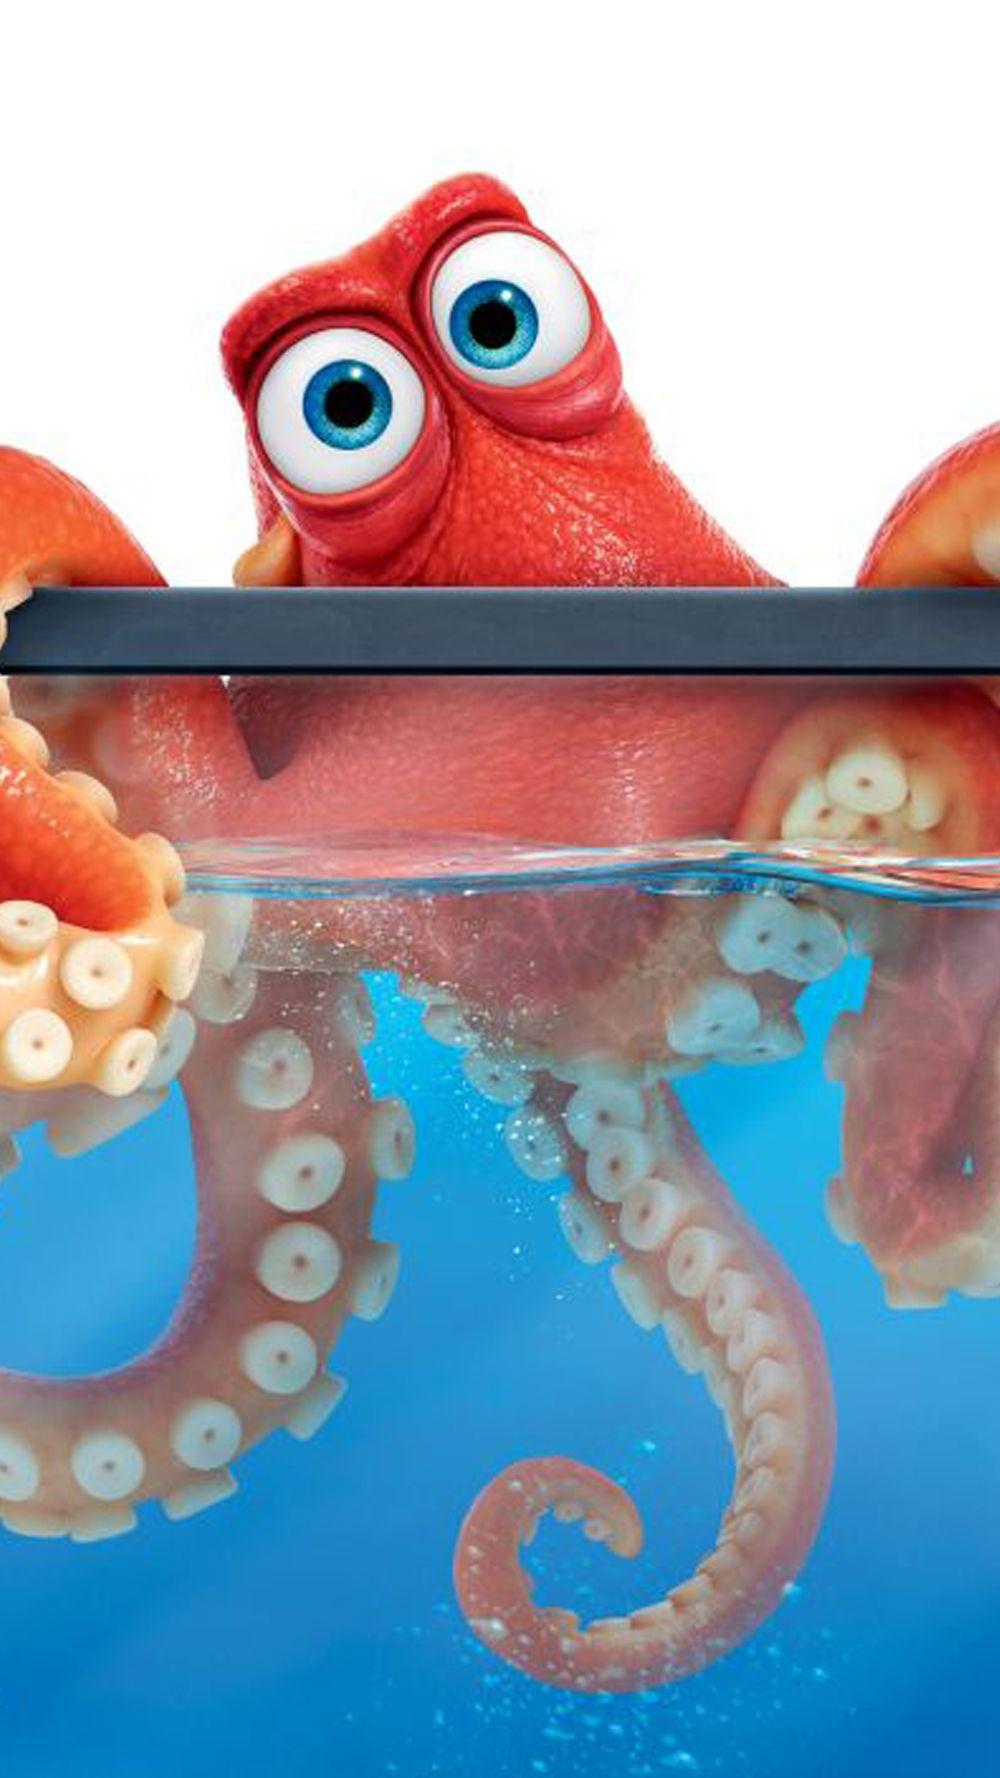 Octopus iPhone Wallpapers - Top Free Octopus iPhone